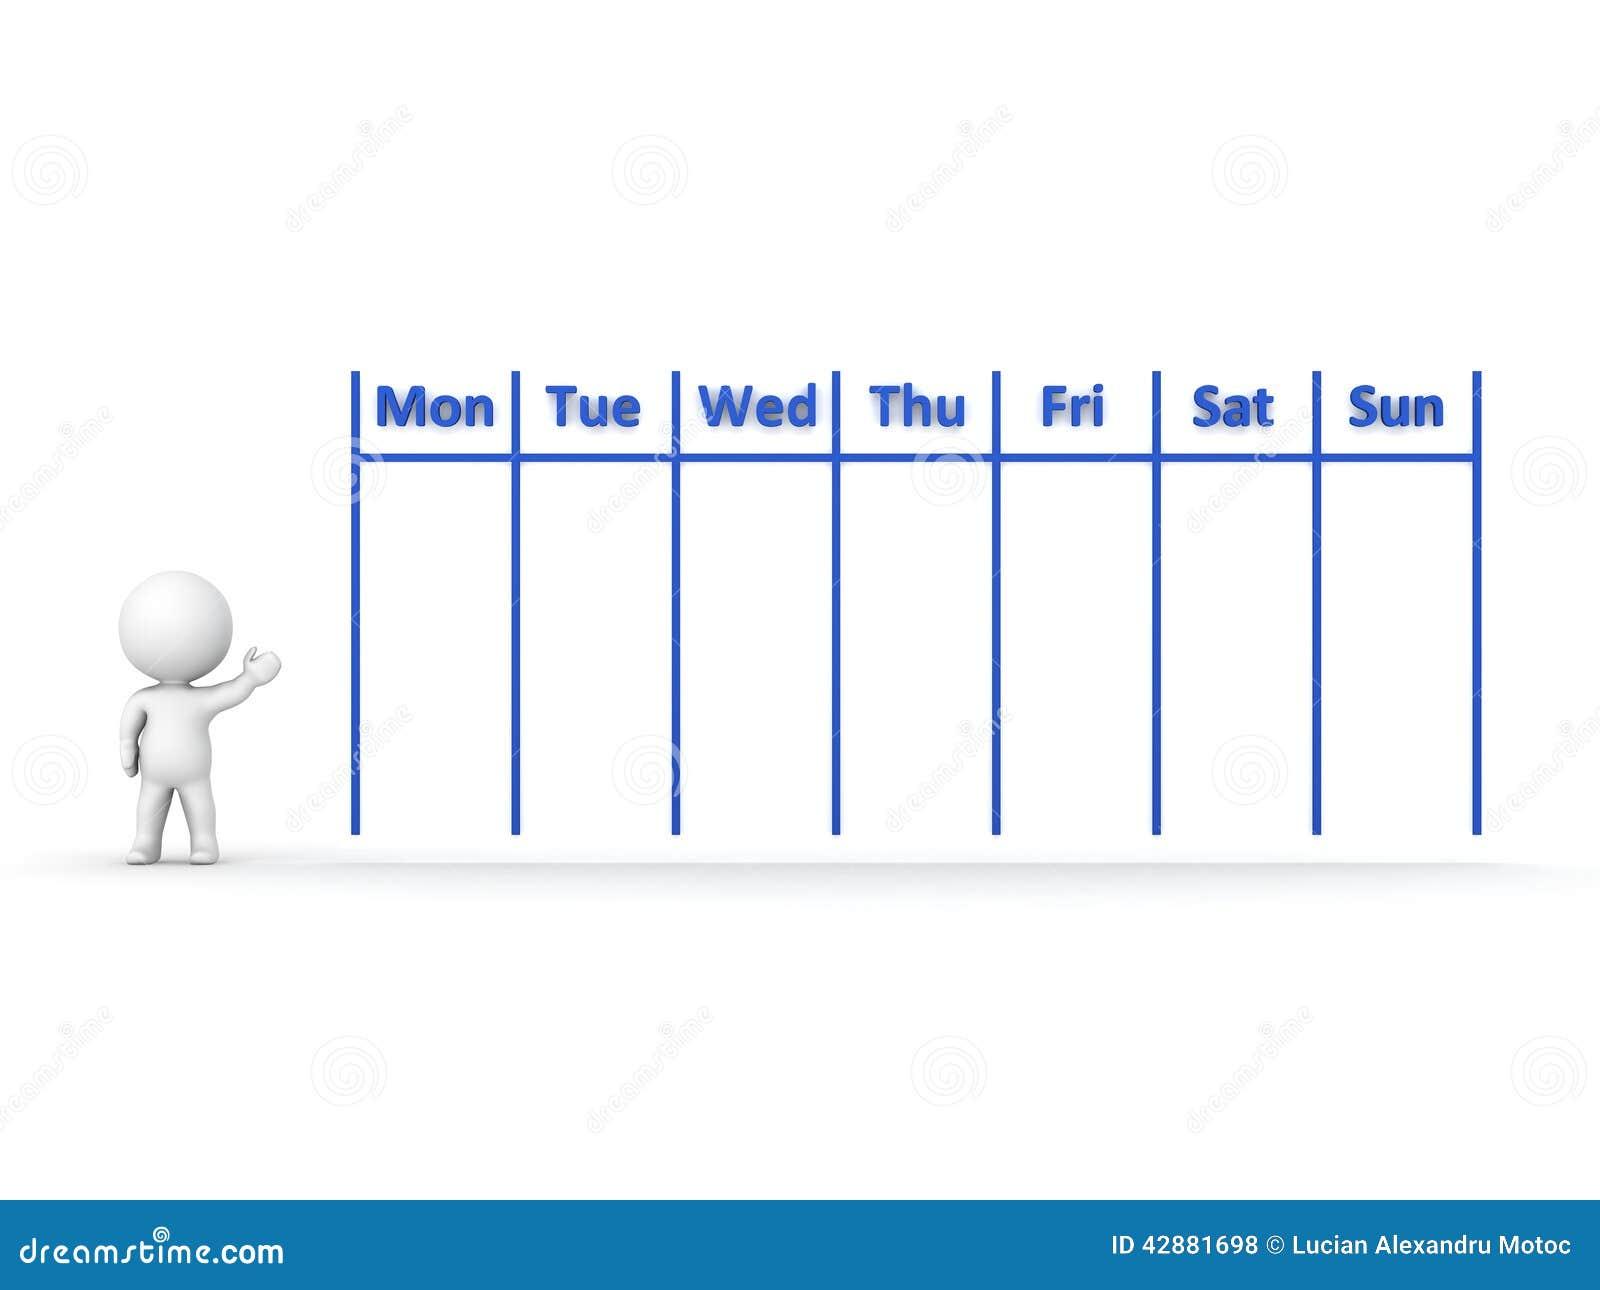 Semana Calendario.Caracter 3d Que Muestra El Calendario Para La Semana Stock De